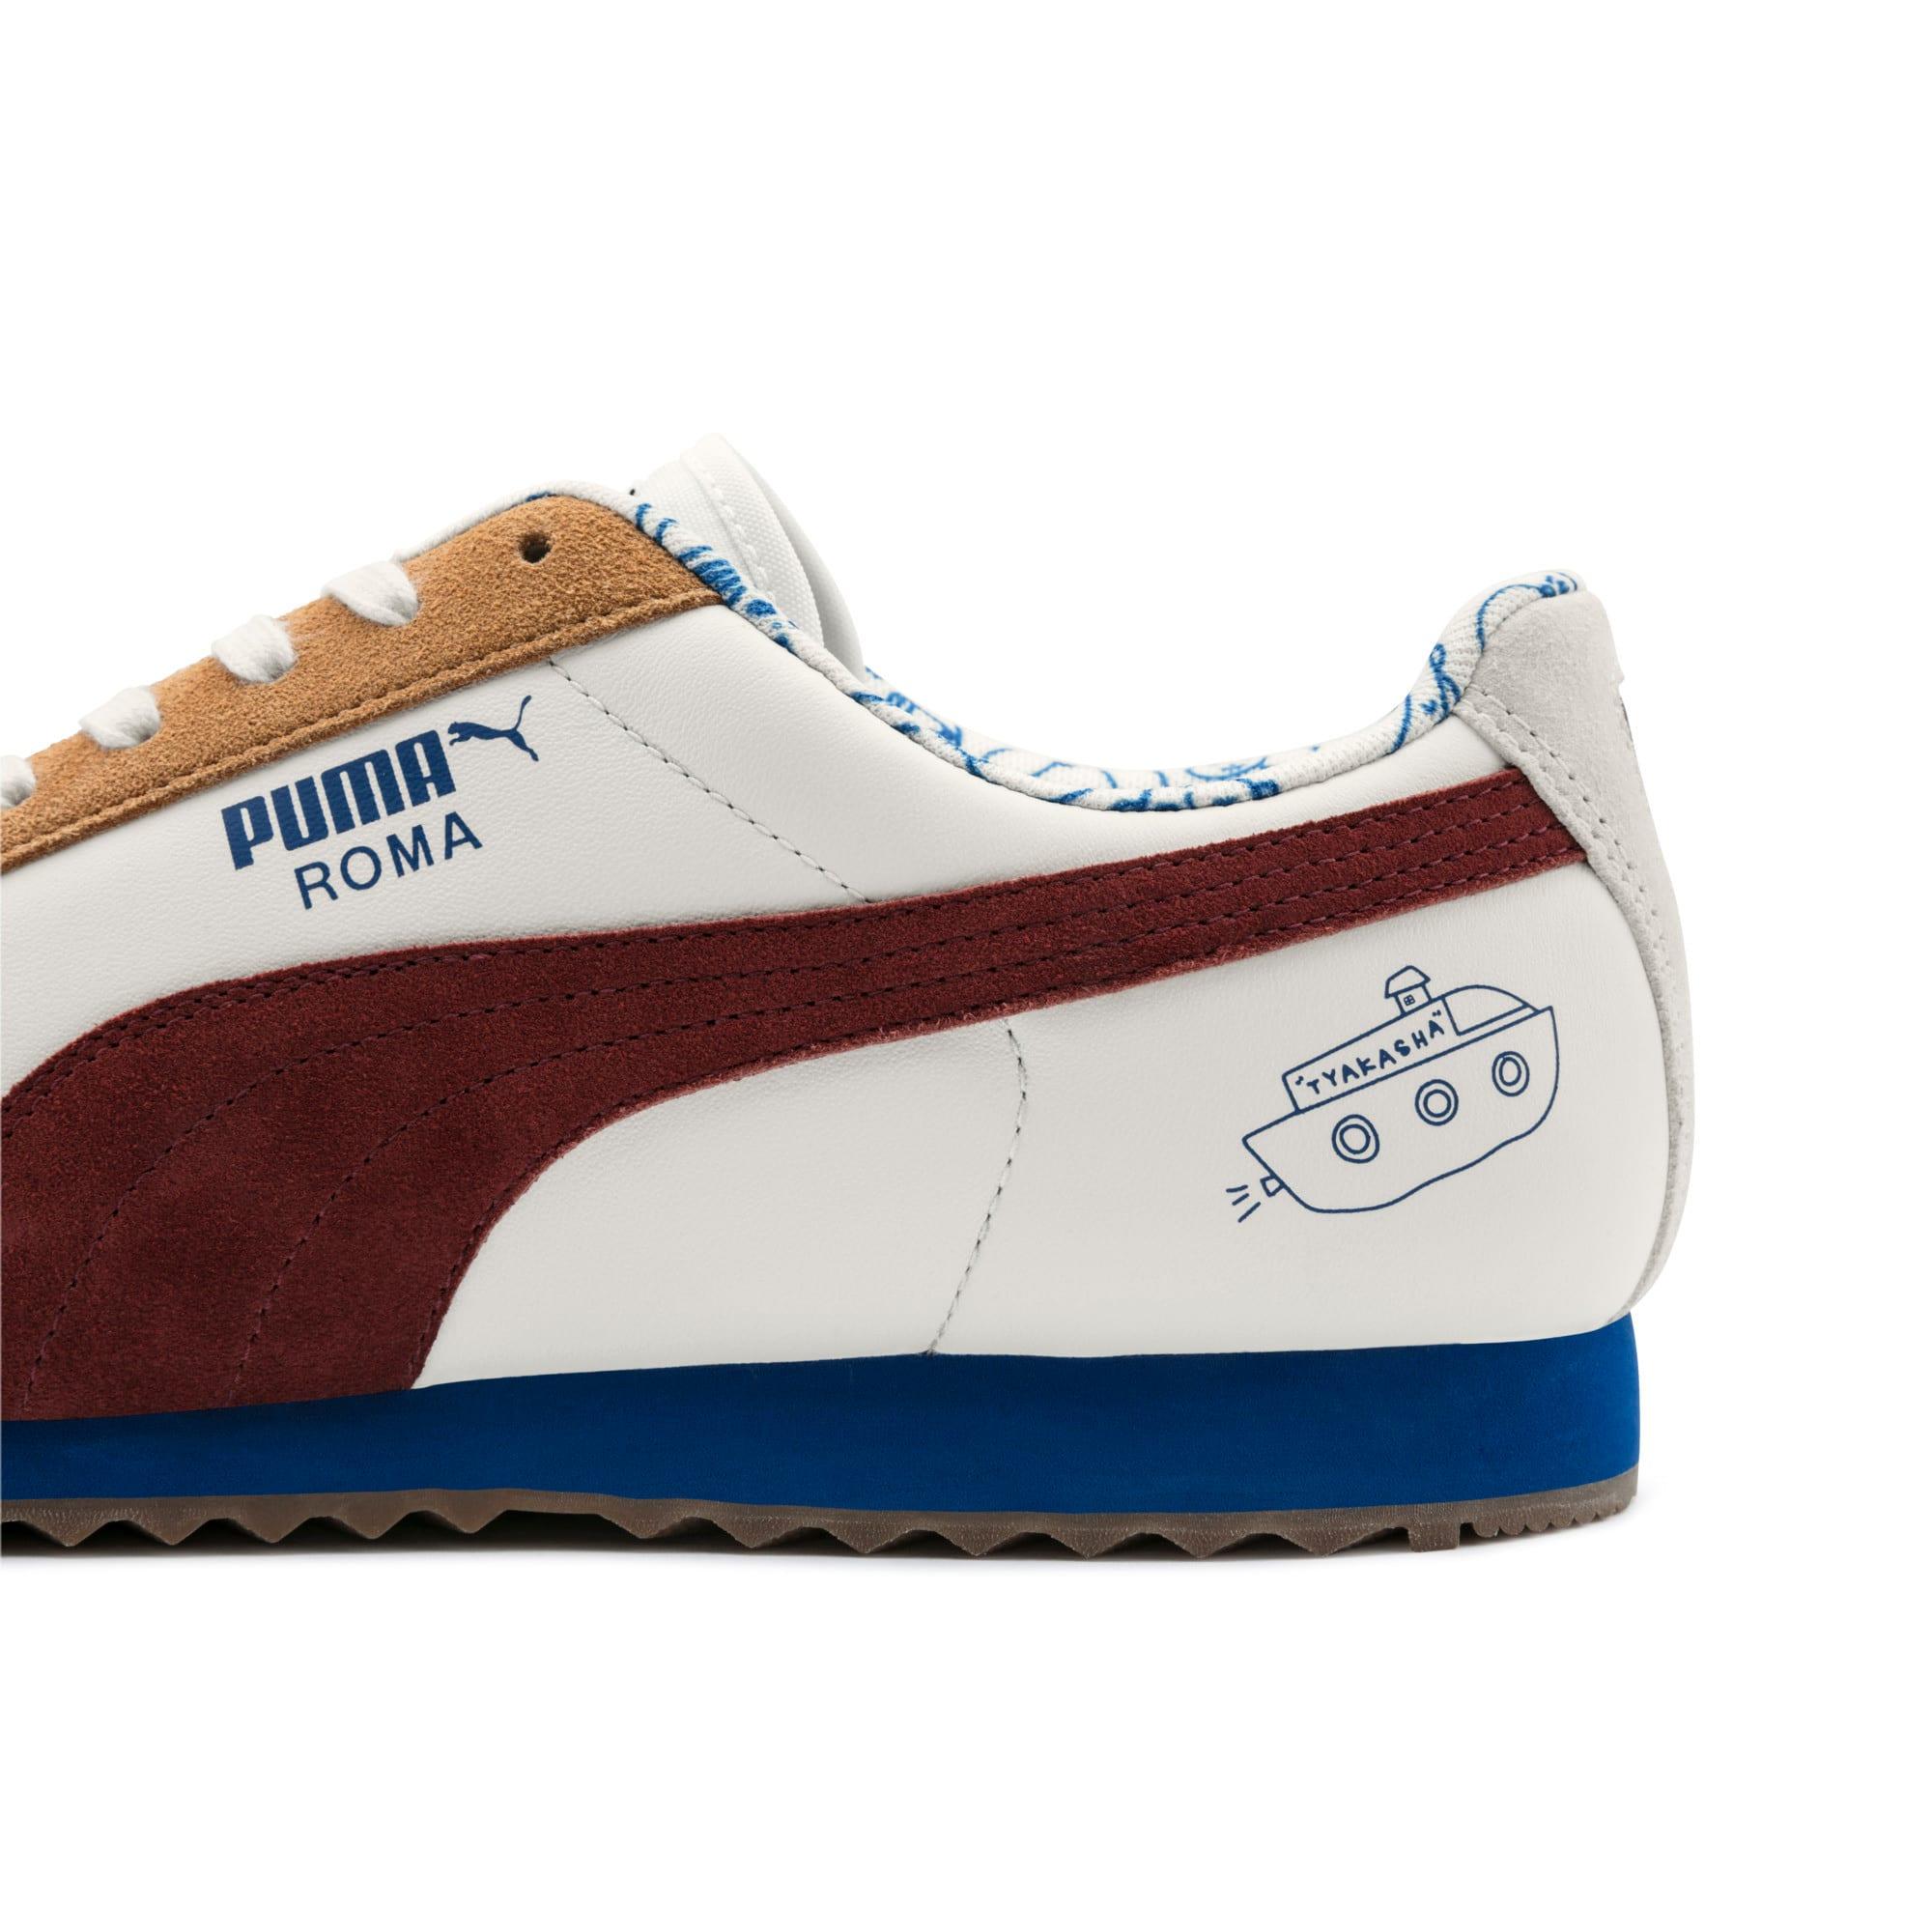 Thumbnail 9 of PUMA x TYAKASHA Roma Sneakers, Marshmallow-Fired Brick, medium